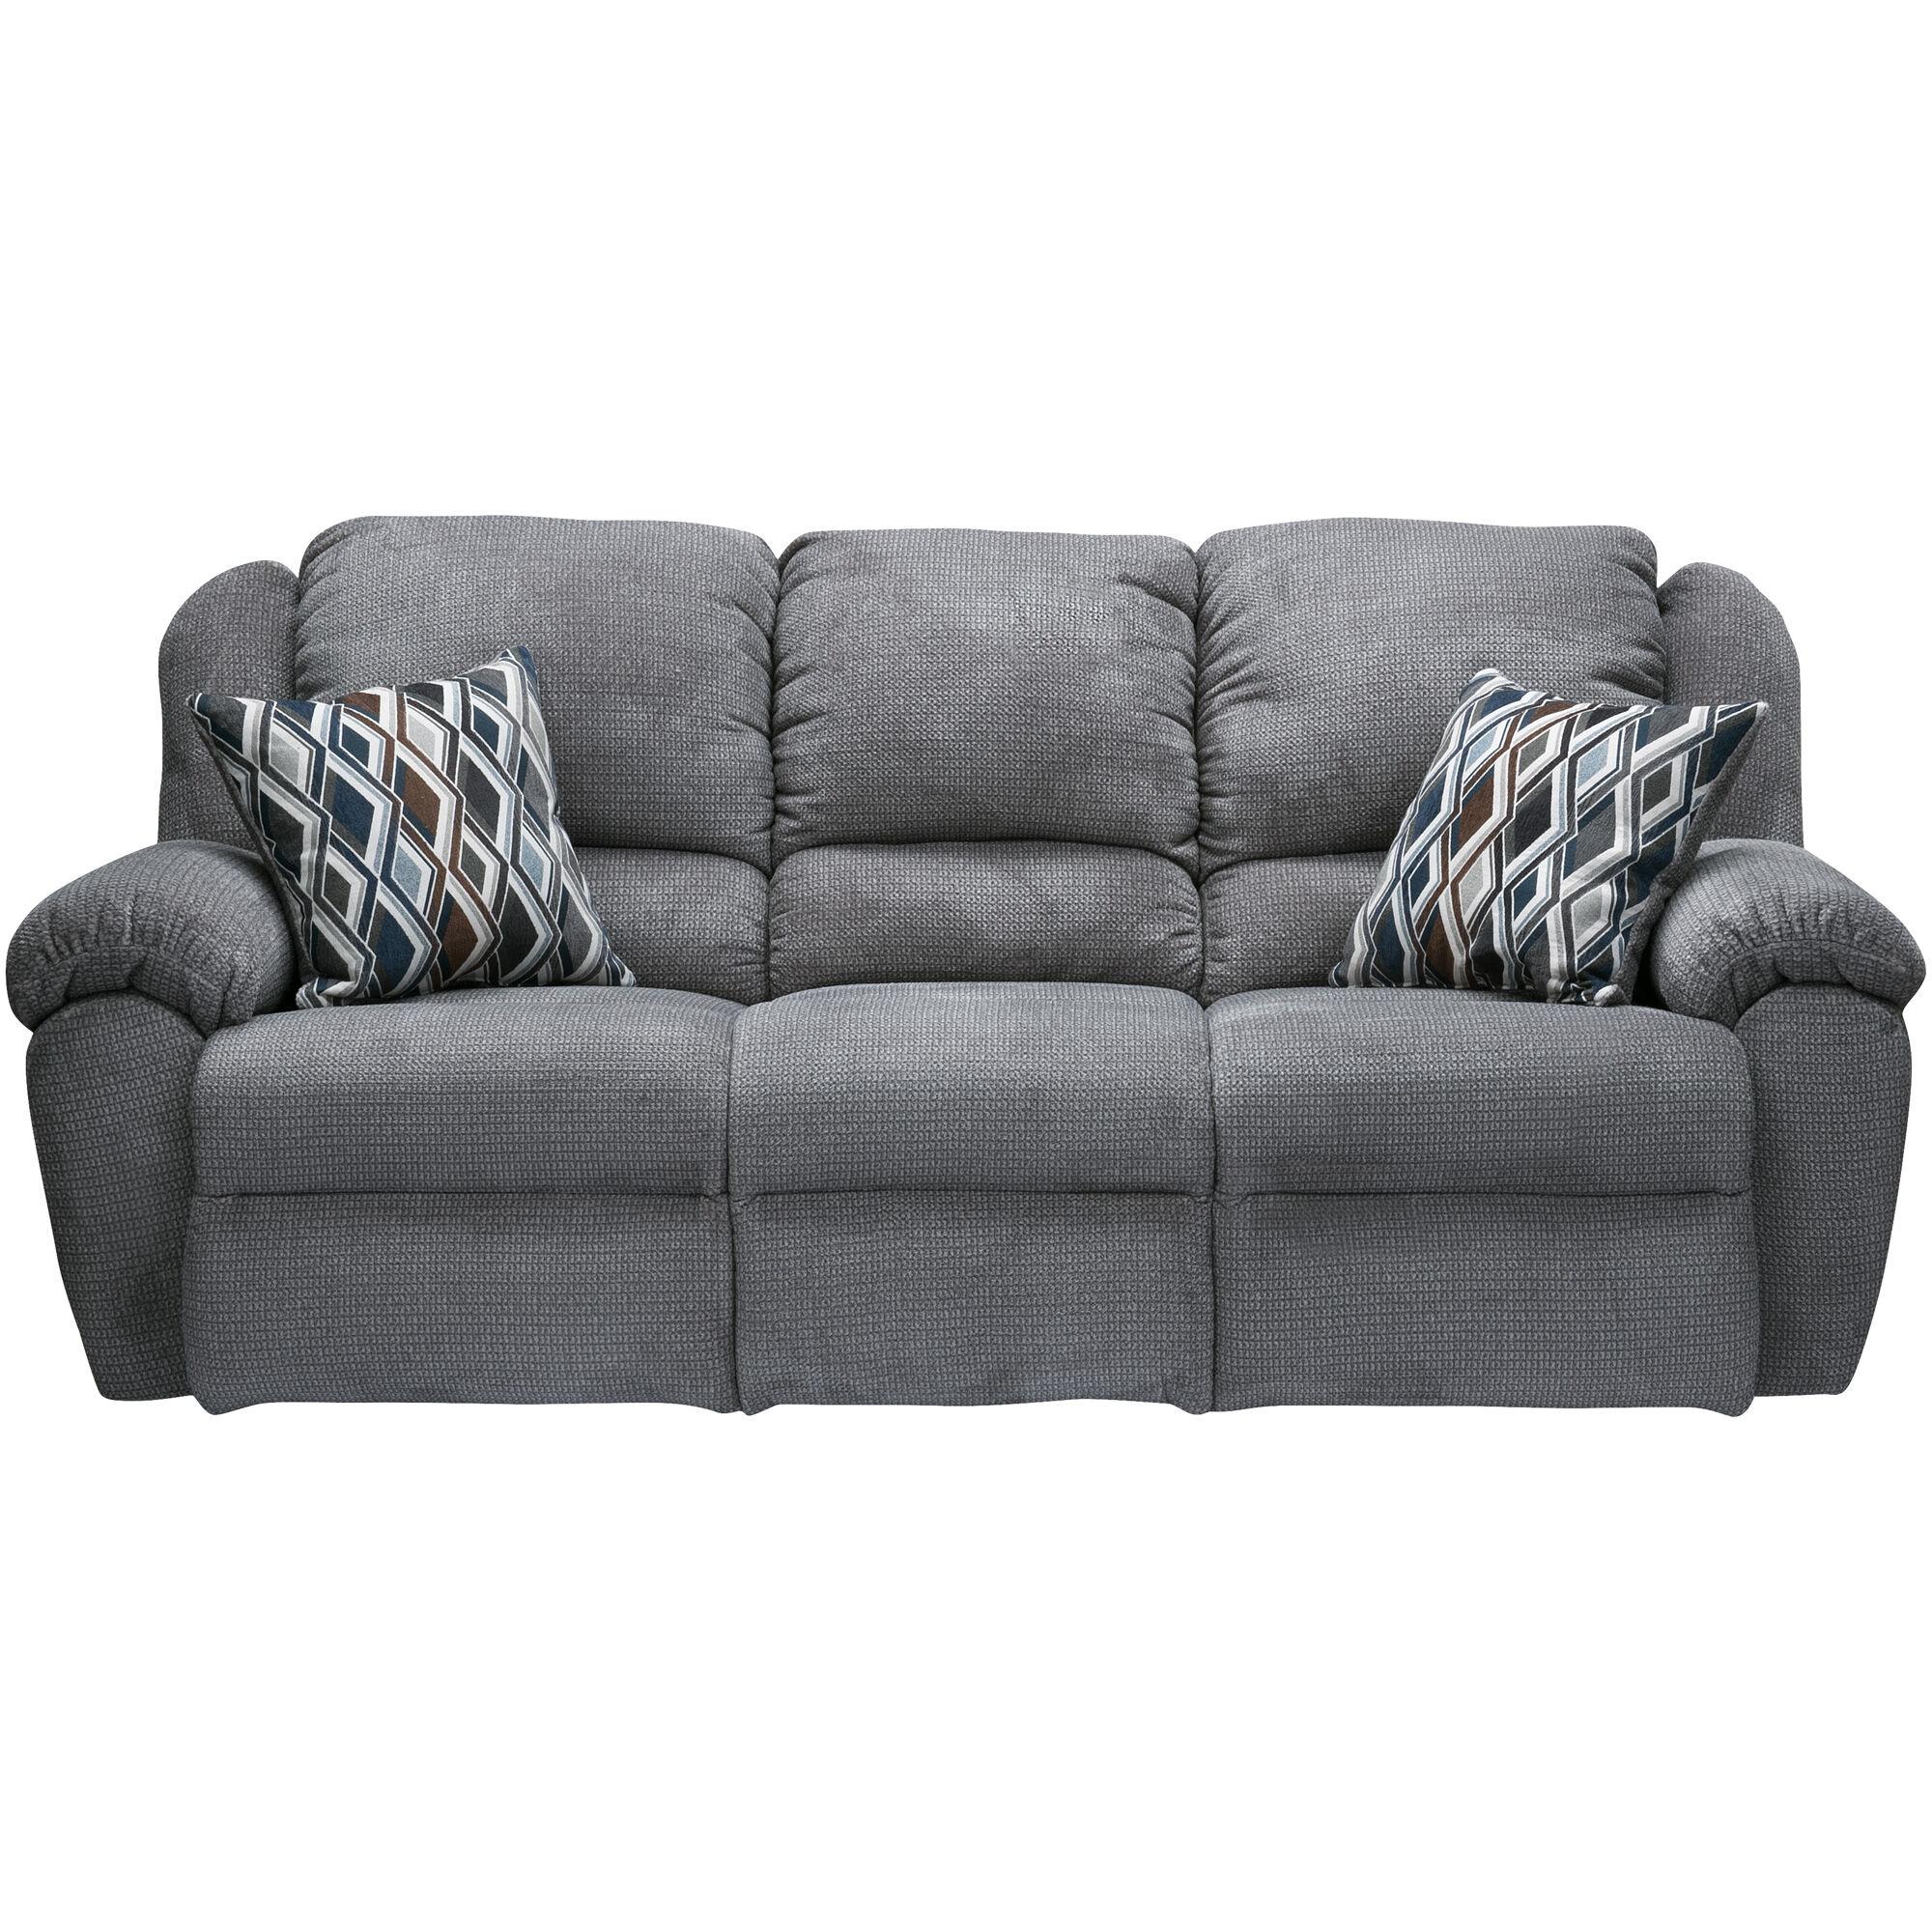 slumberland sofa recliners fainting images furniture | burnaby gray reclining